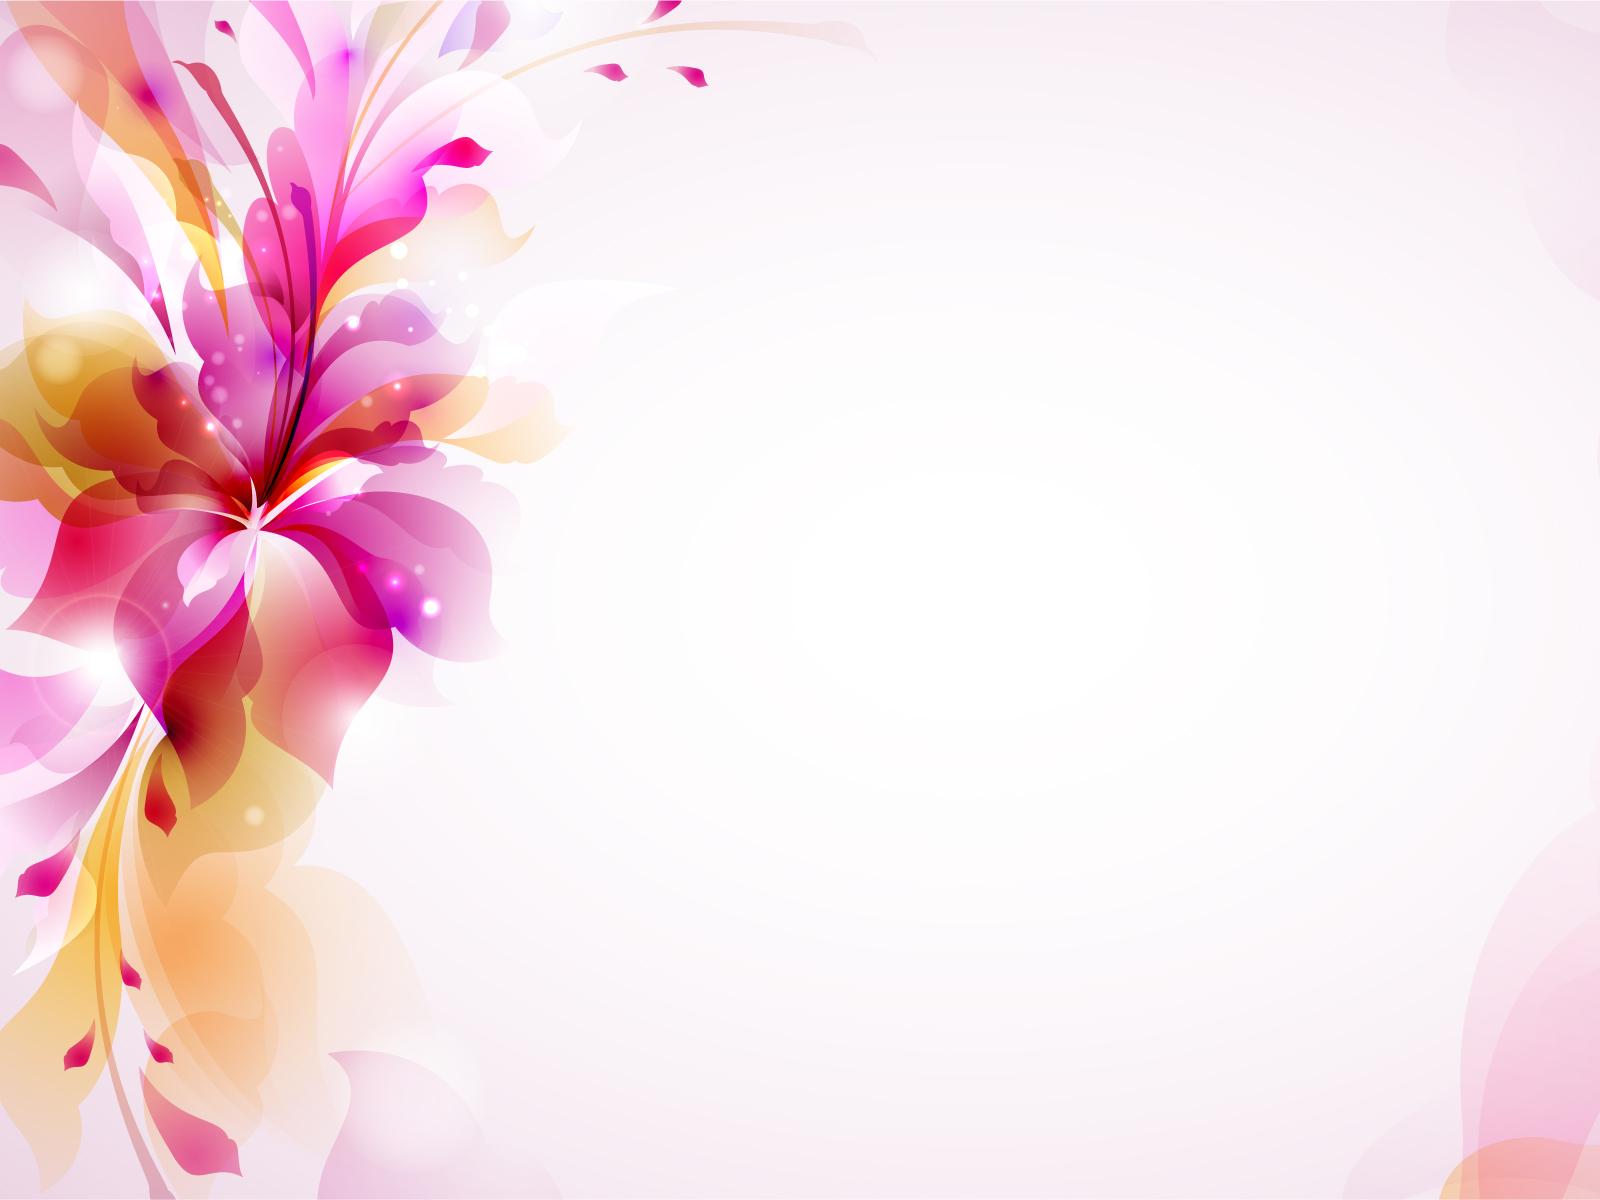 Colorful Design Floral Backgrounds Flowers Orange Purple